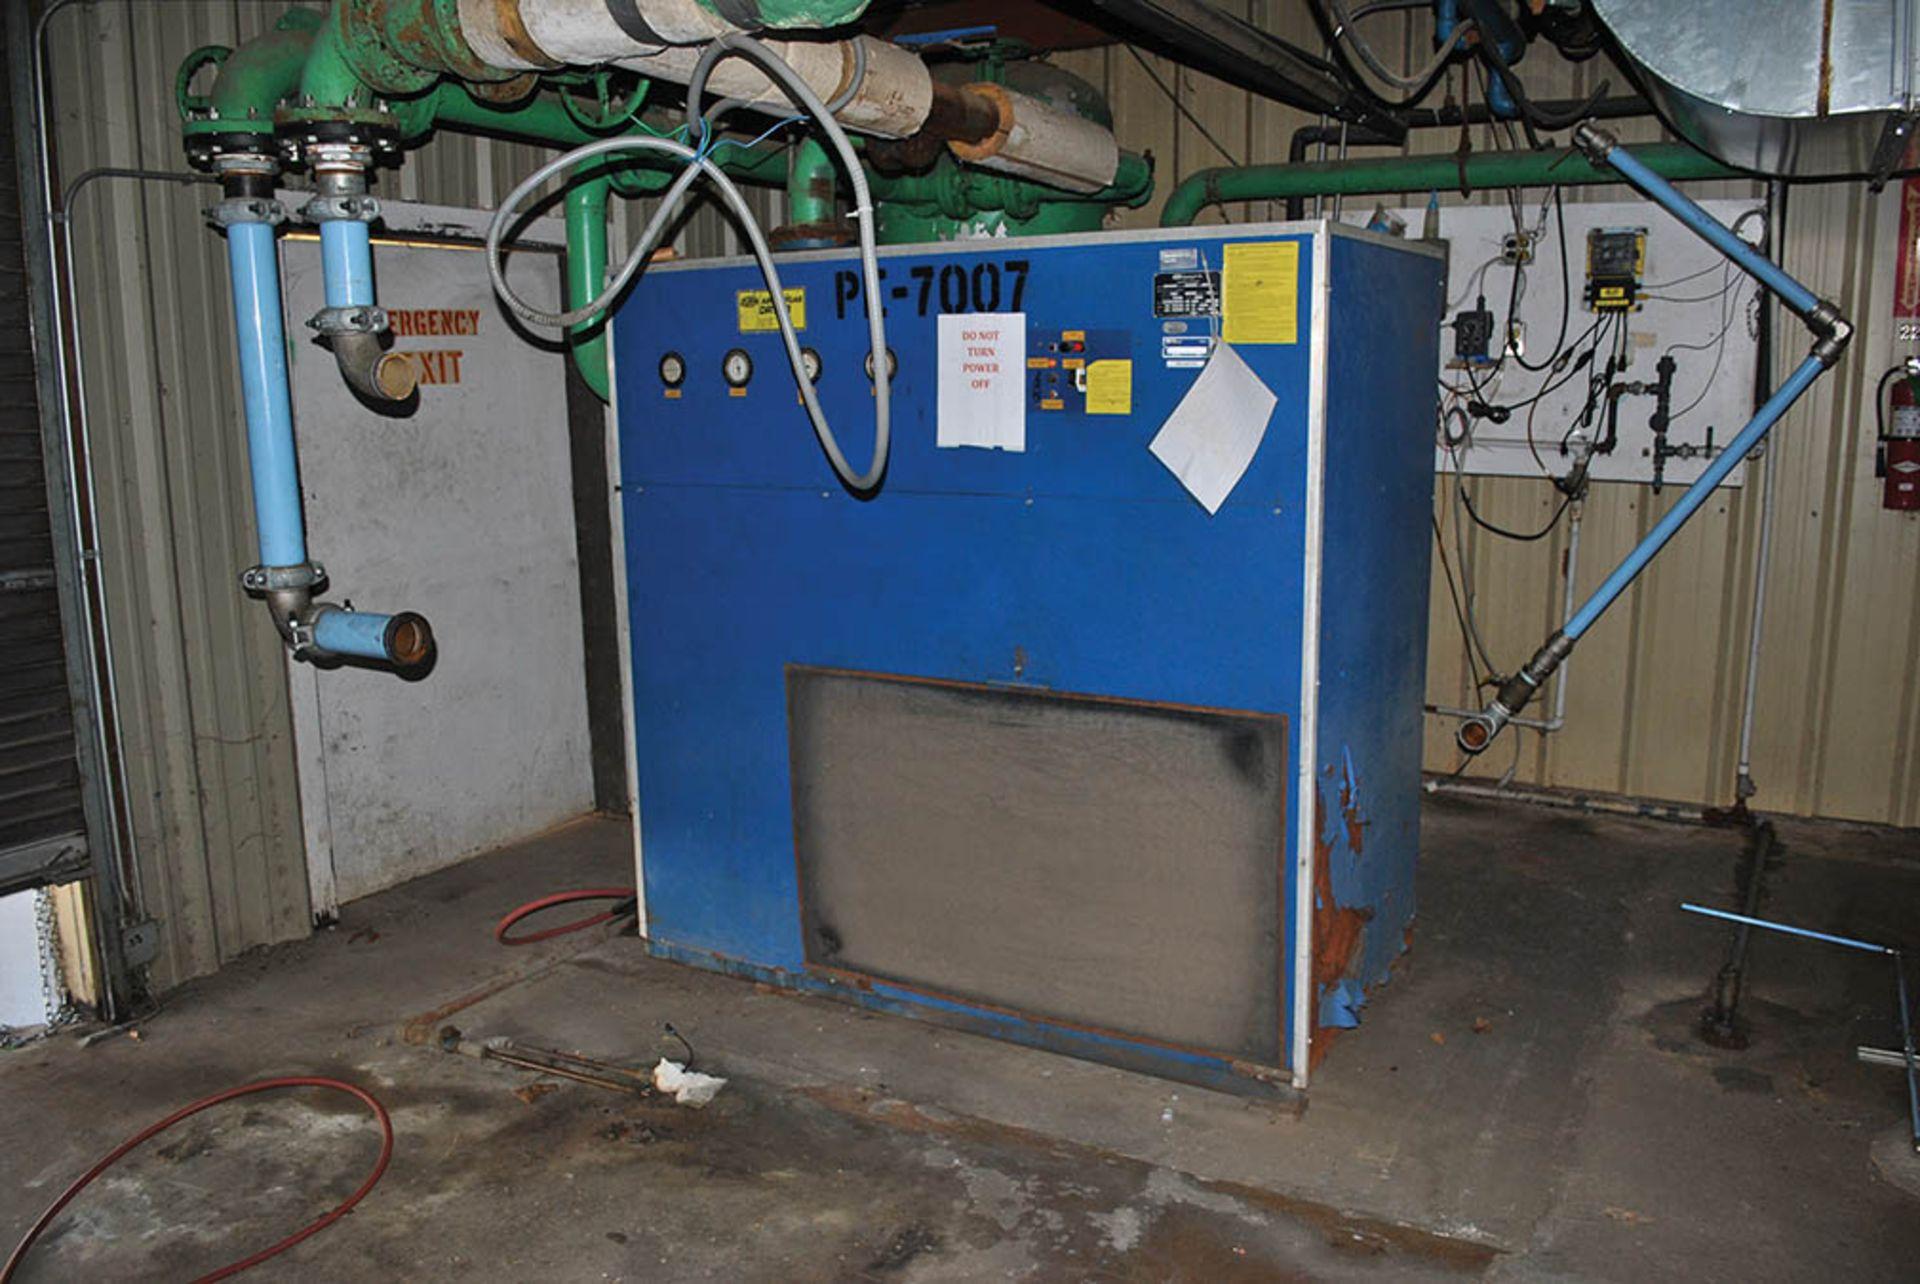 Lot 53 - ZURN AIR DRYING SYSTEM BY KAESER, MODEL R200A, S/N R11186